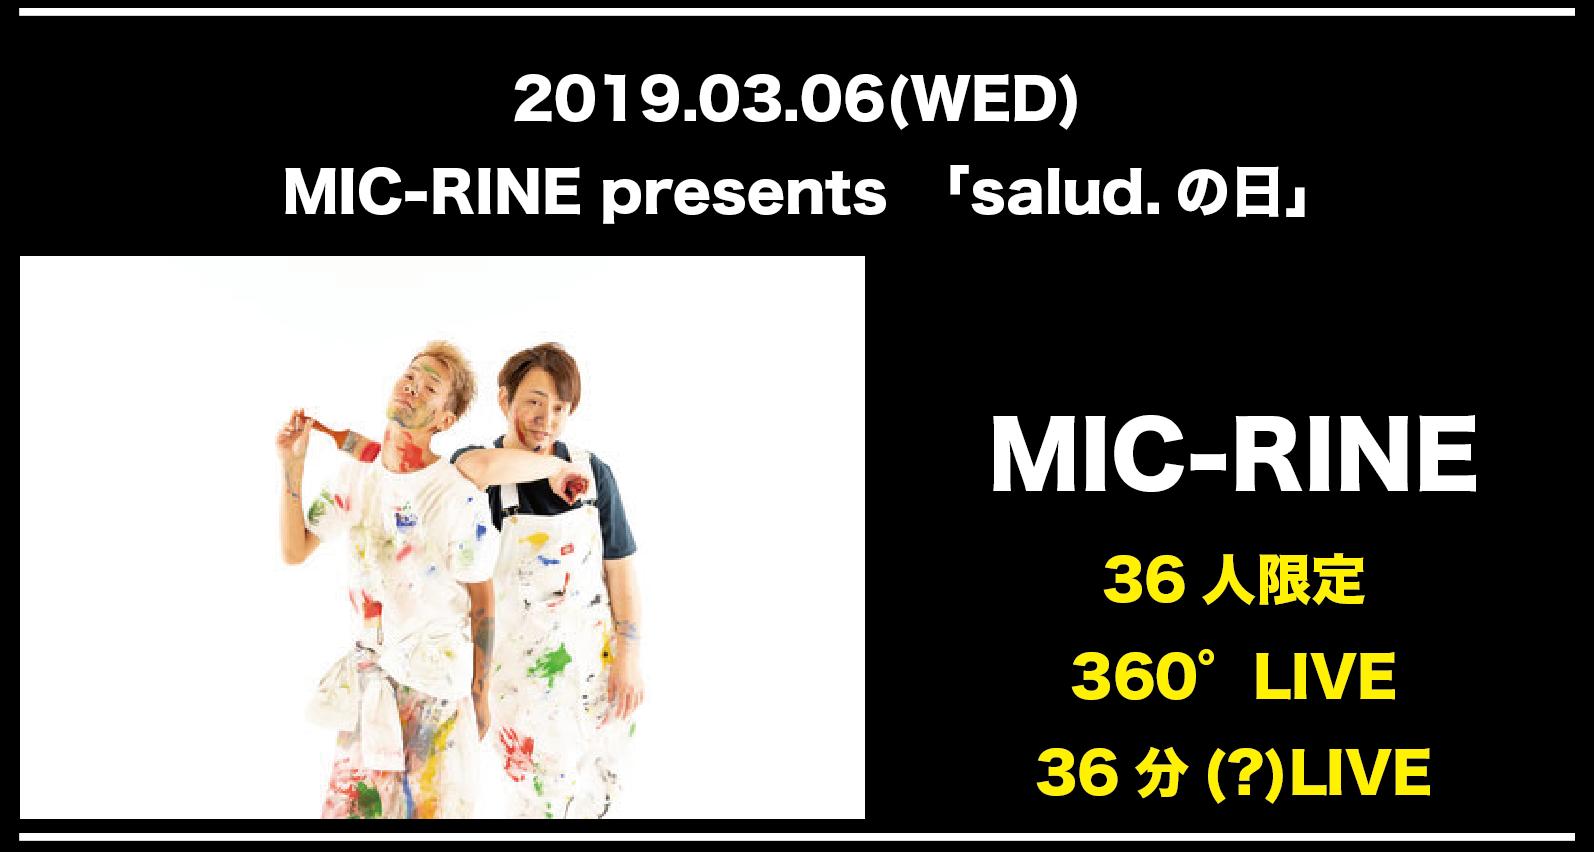 MIC-RINE presents 「salud.の日」